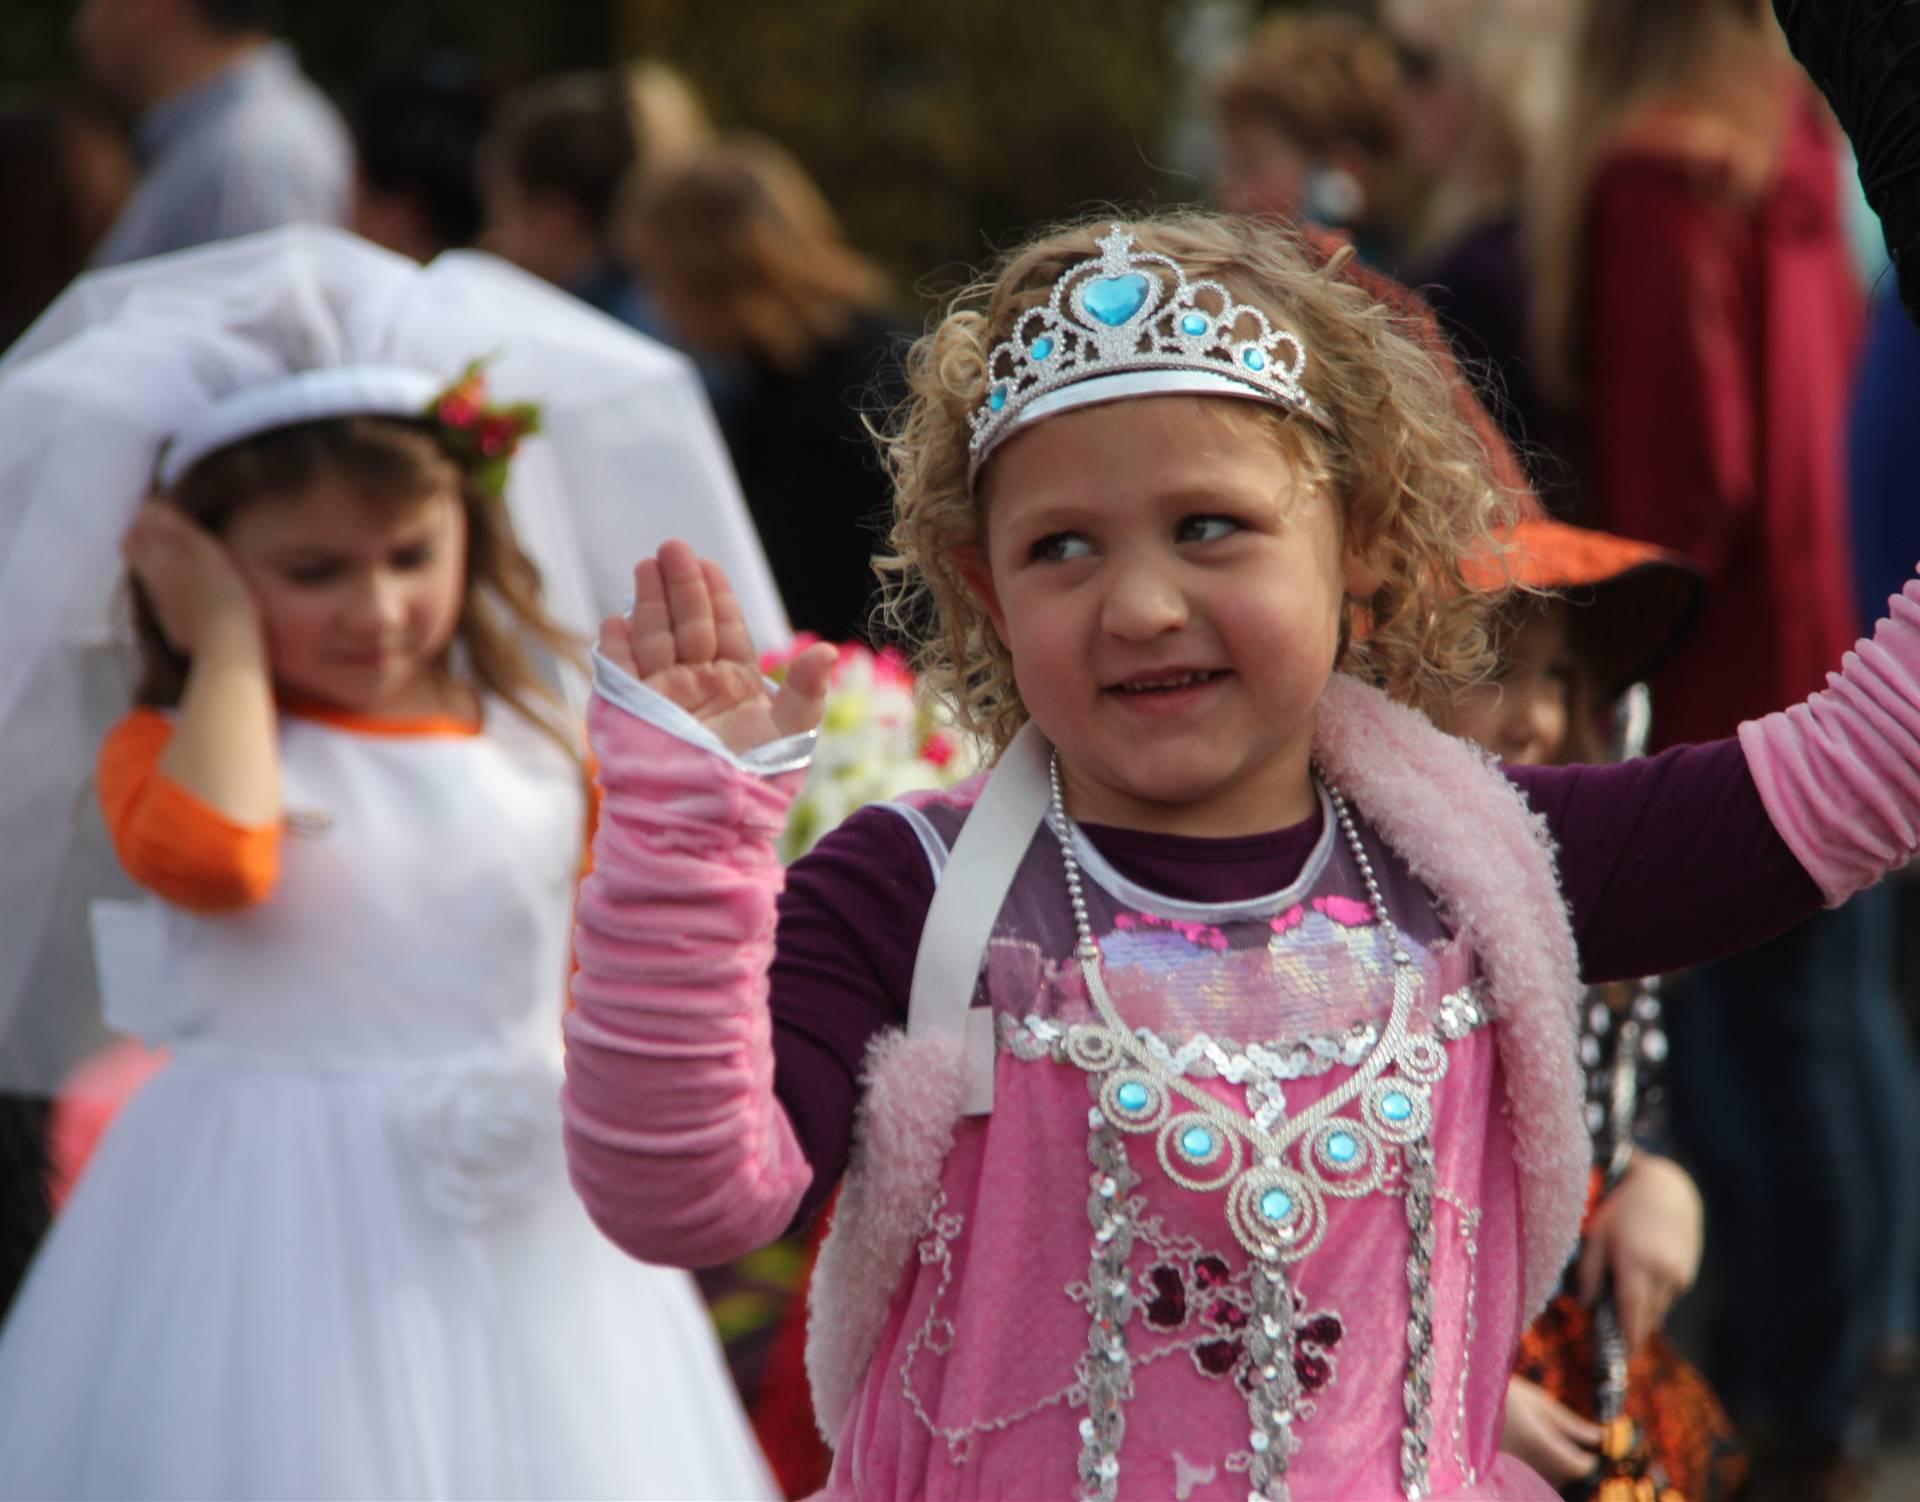 student waving wearing halloween costume